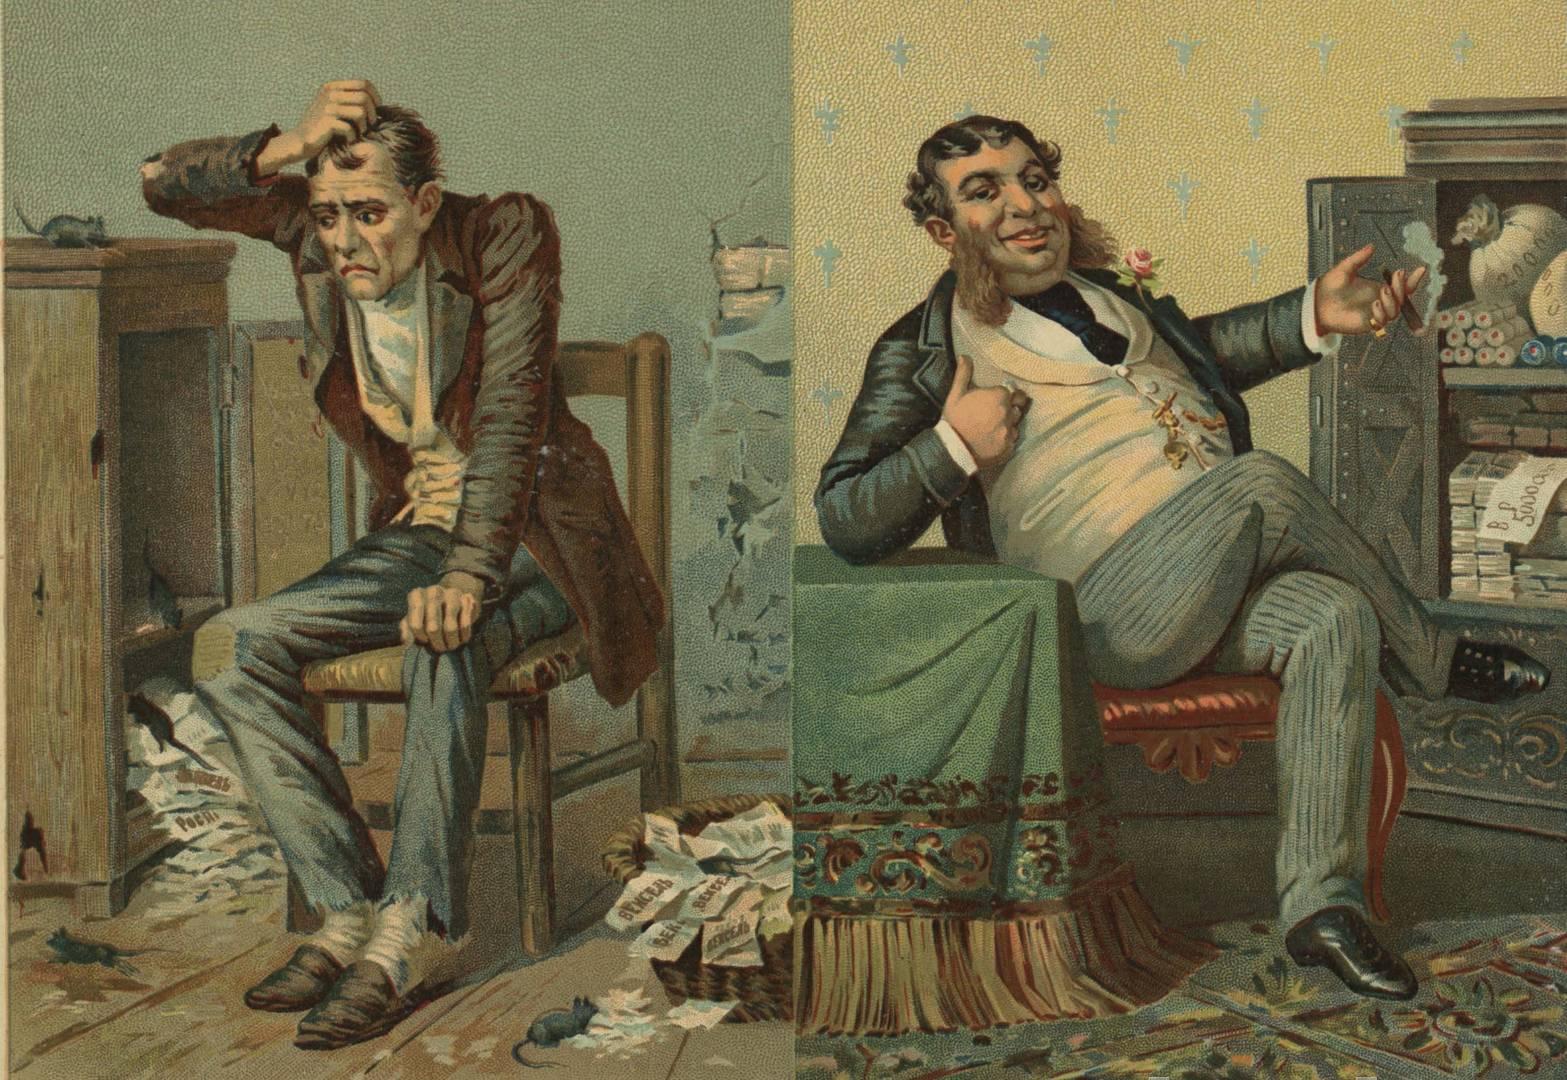 Богач и бедняк. Плакат. 1902